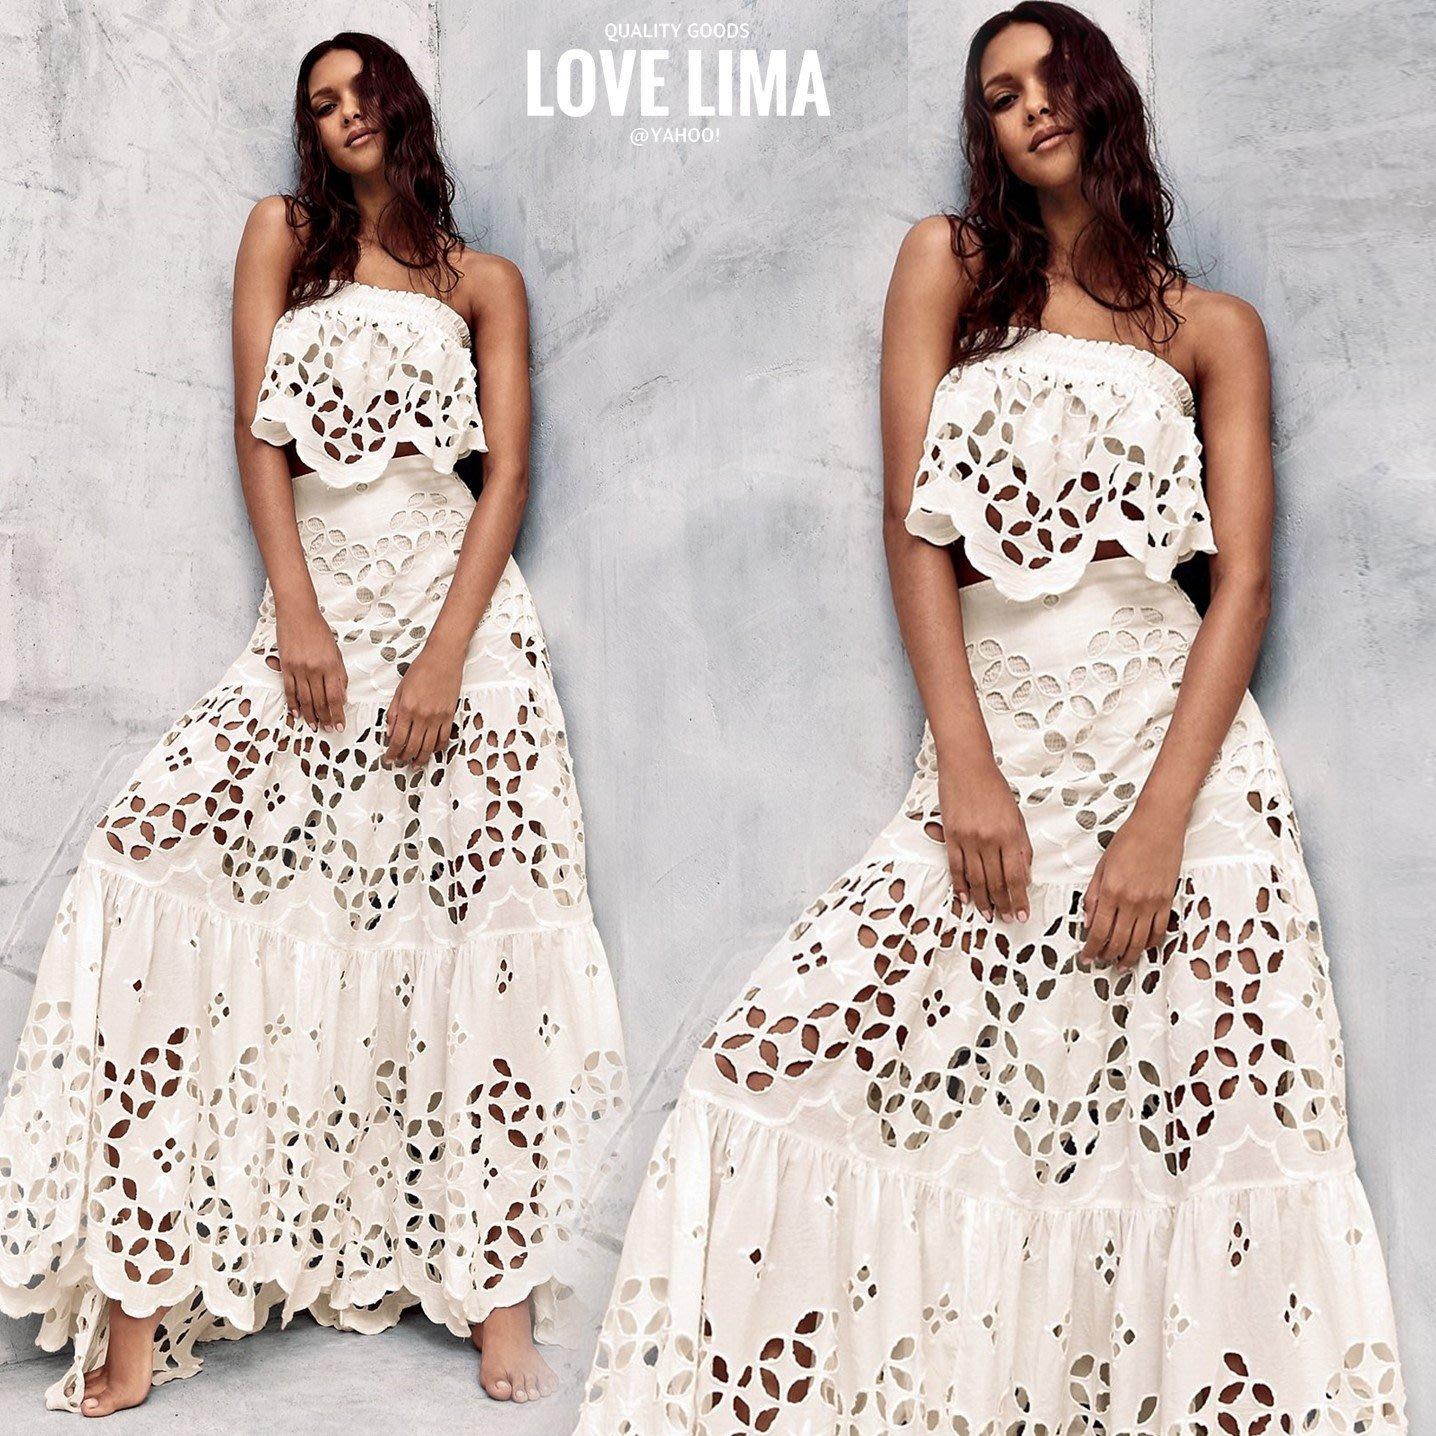 【Love Lima 】美國設計師 淺藍紫色/黑色 平口蕾絲雕花透視荷葉長裙 套裝 長洋裝 禮服